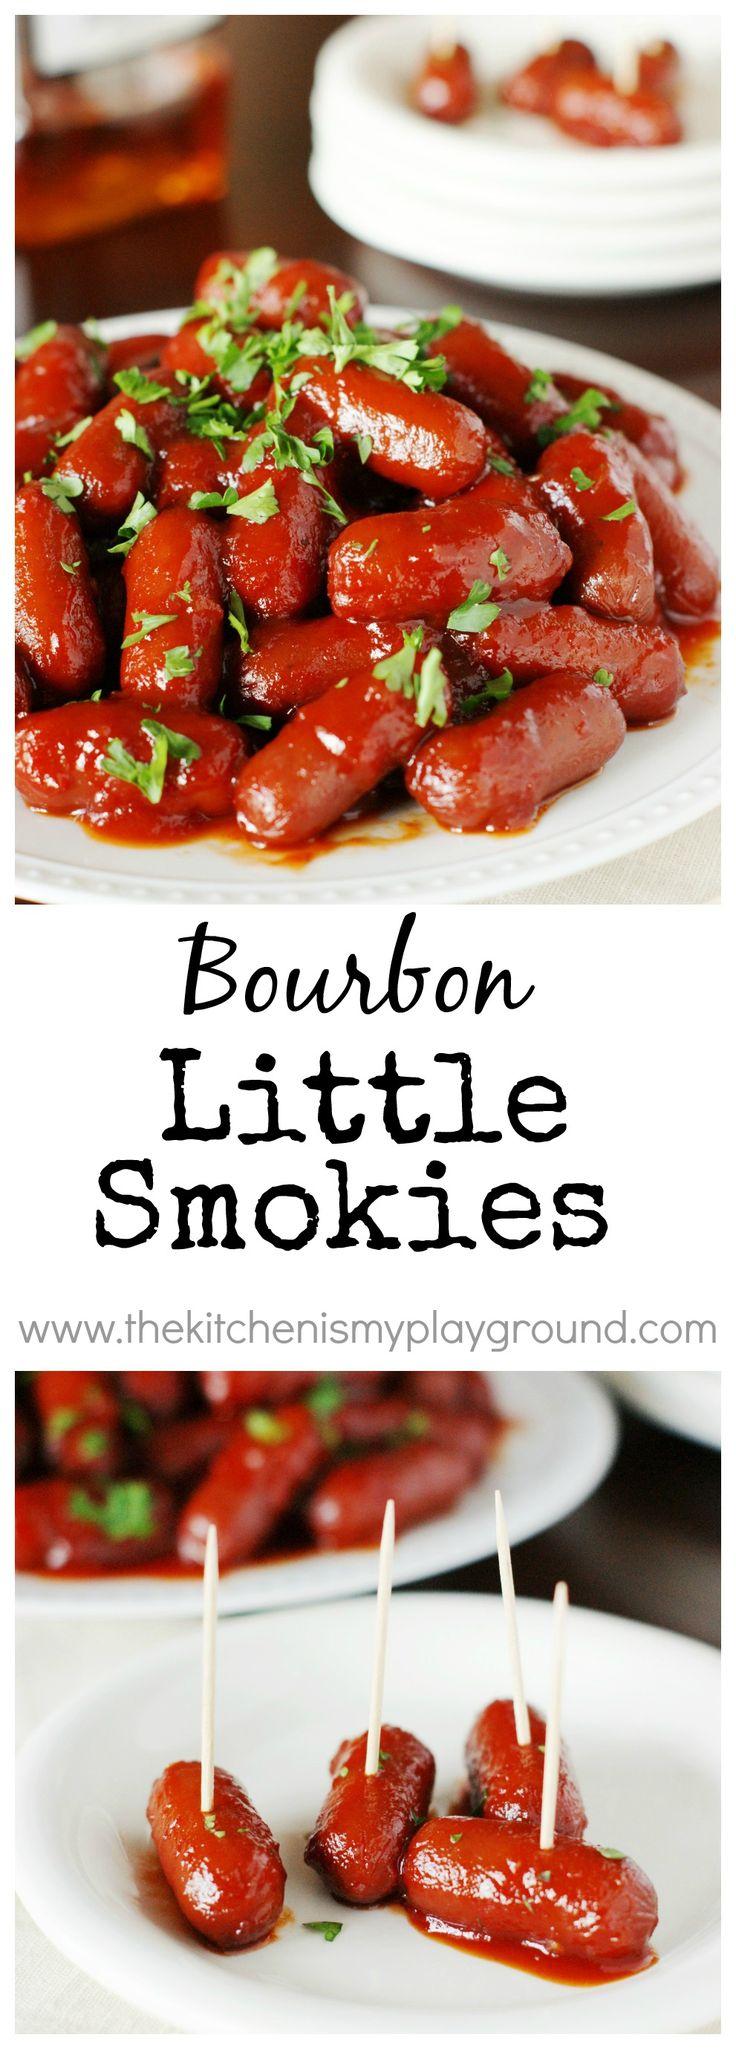 Bourbon Little Smokies ~ party-perfect!   www.thekitchenismyplayground.com